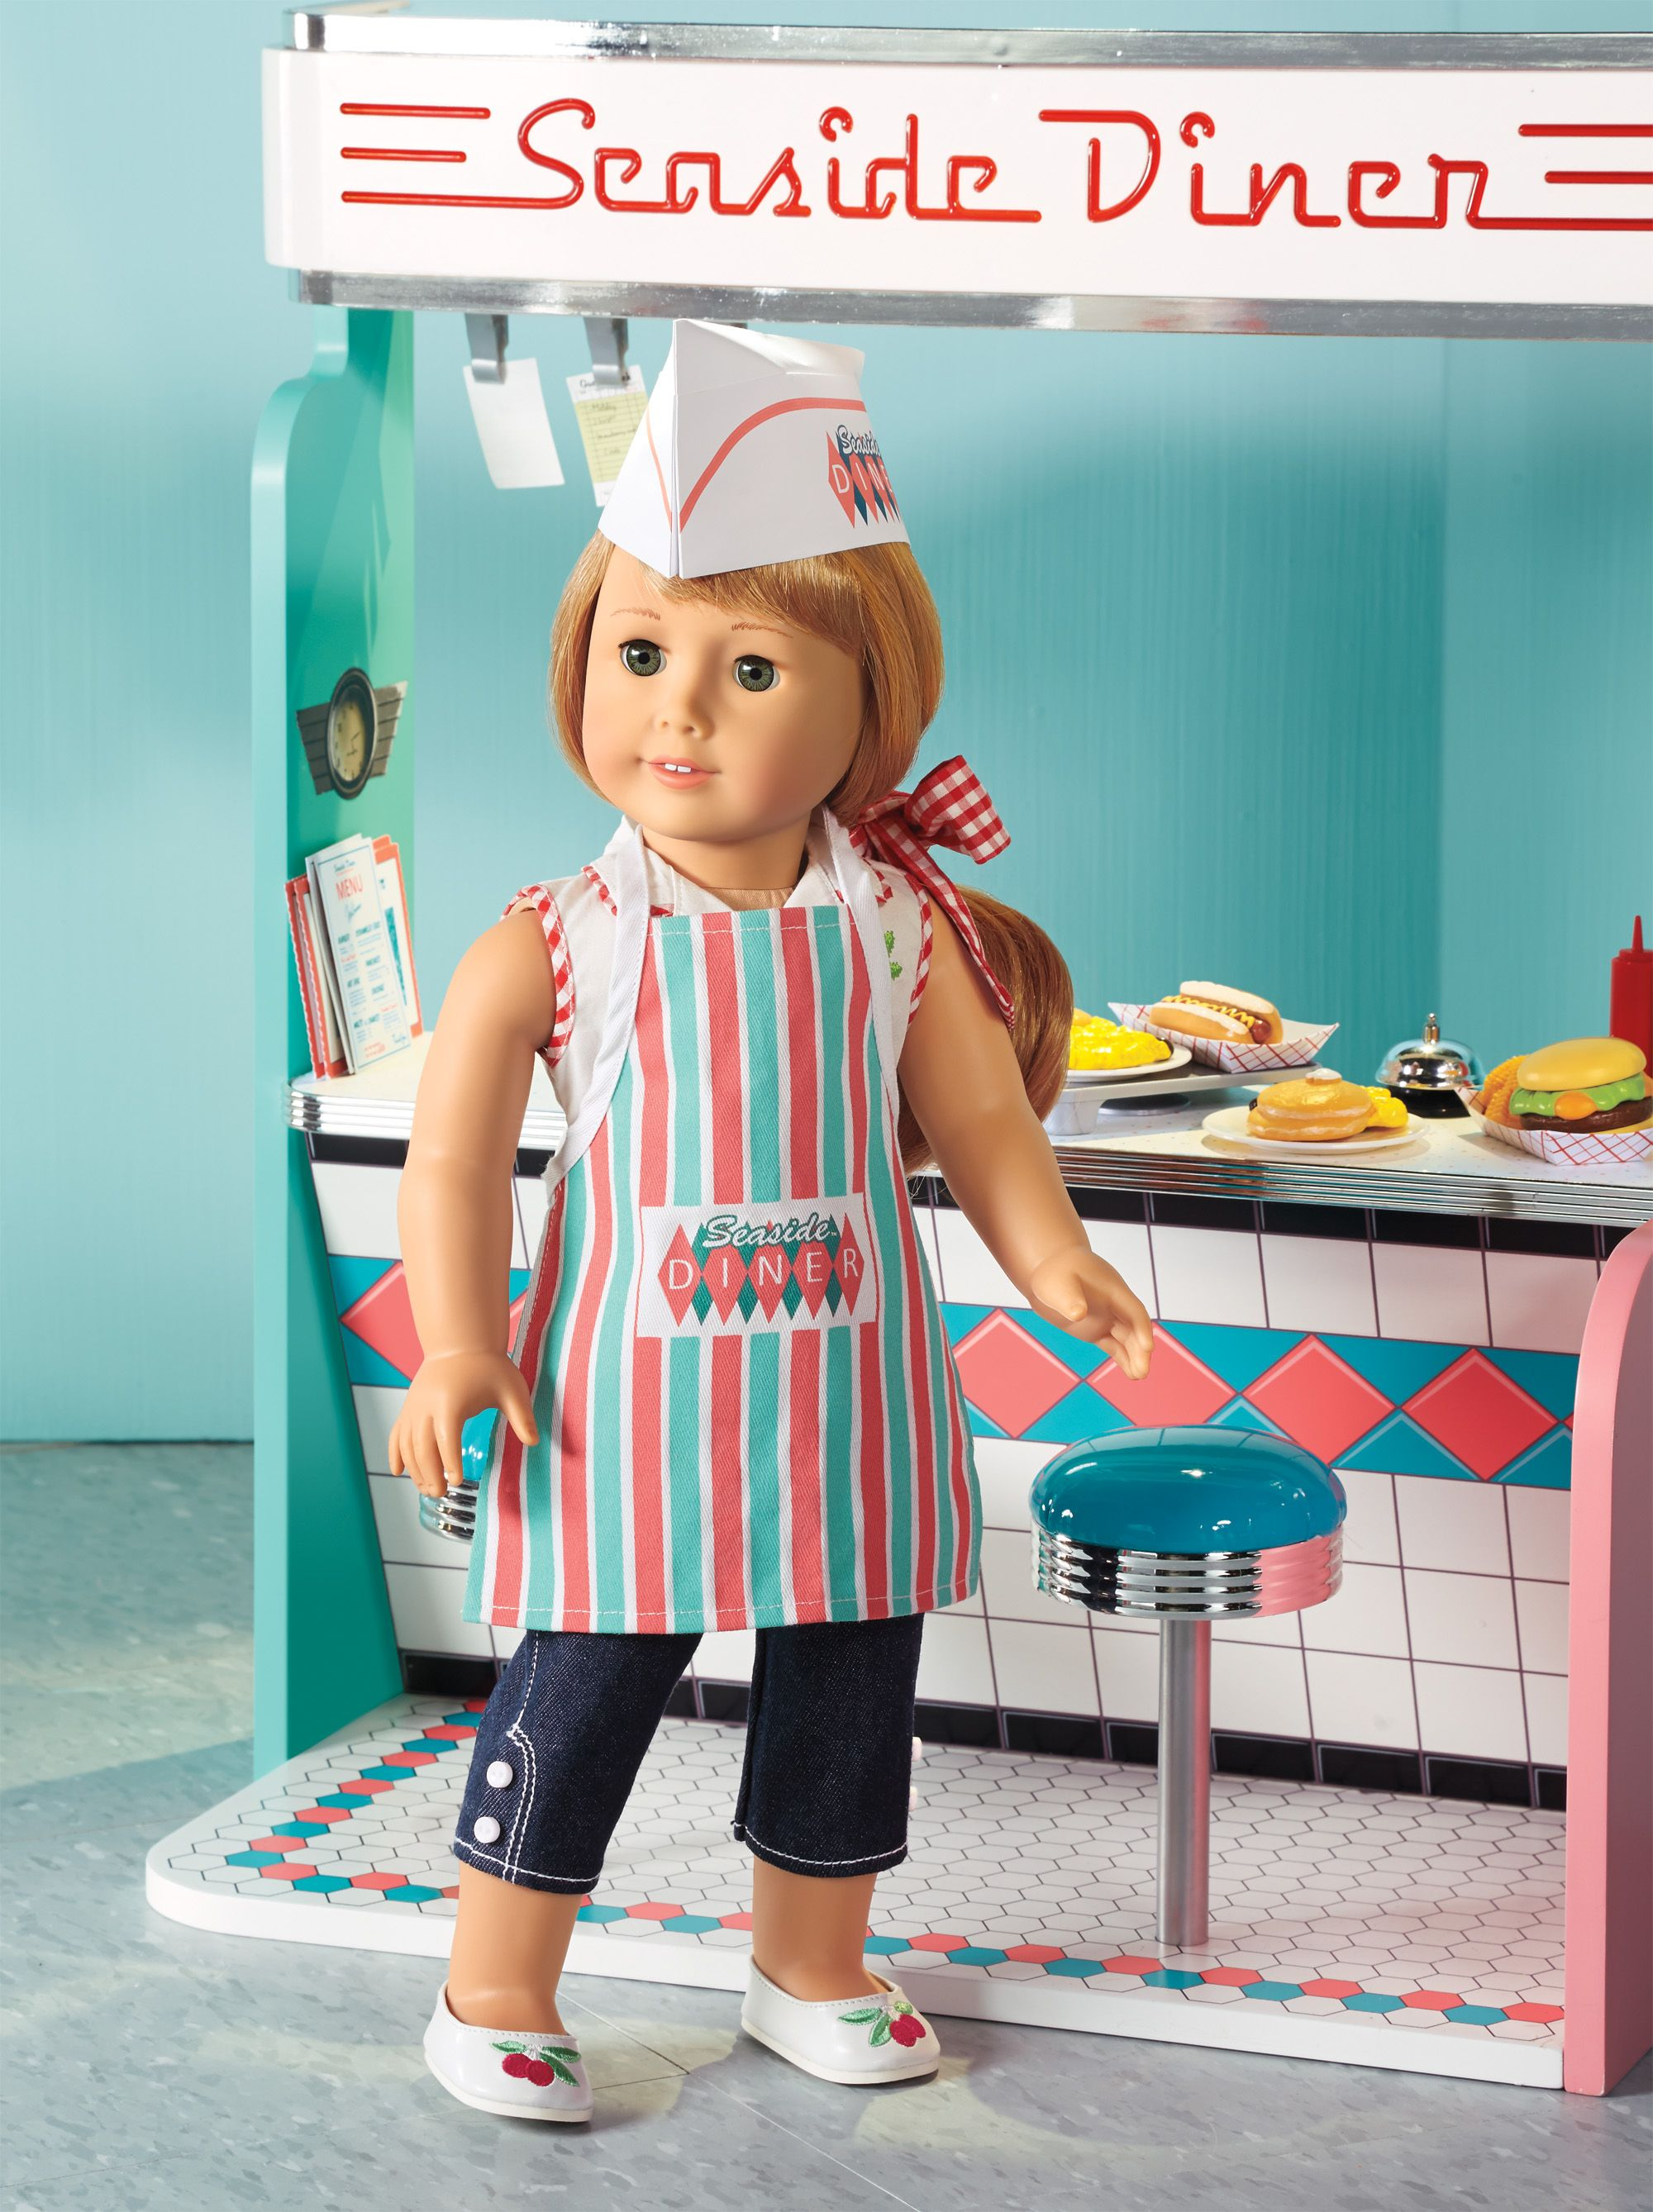 maryellen 39 s diner set archive maryellen american girl new american girl doll dolls. Black Bedroom Furniture Sets. Home Design Ideas